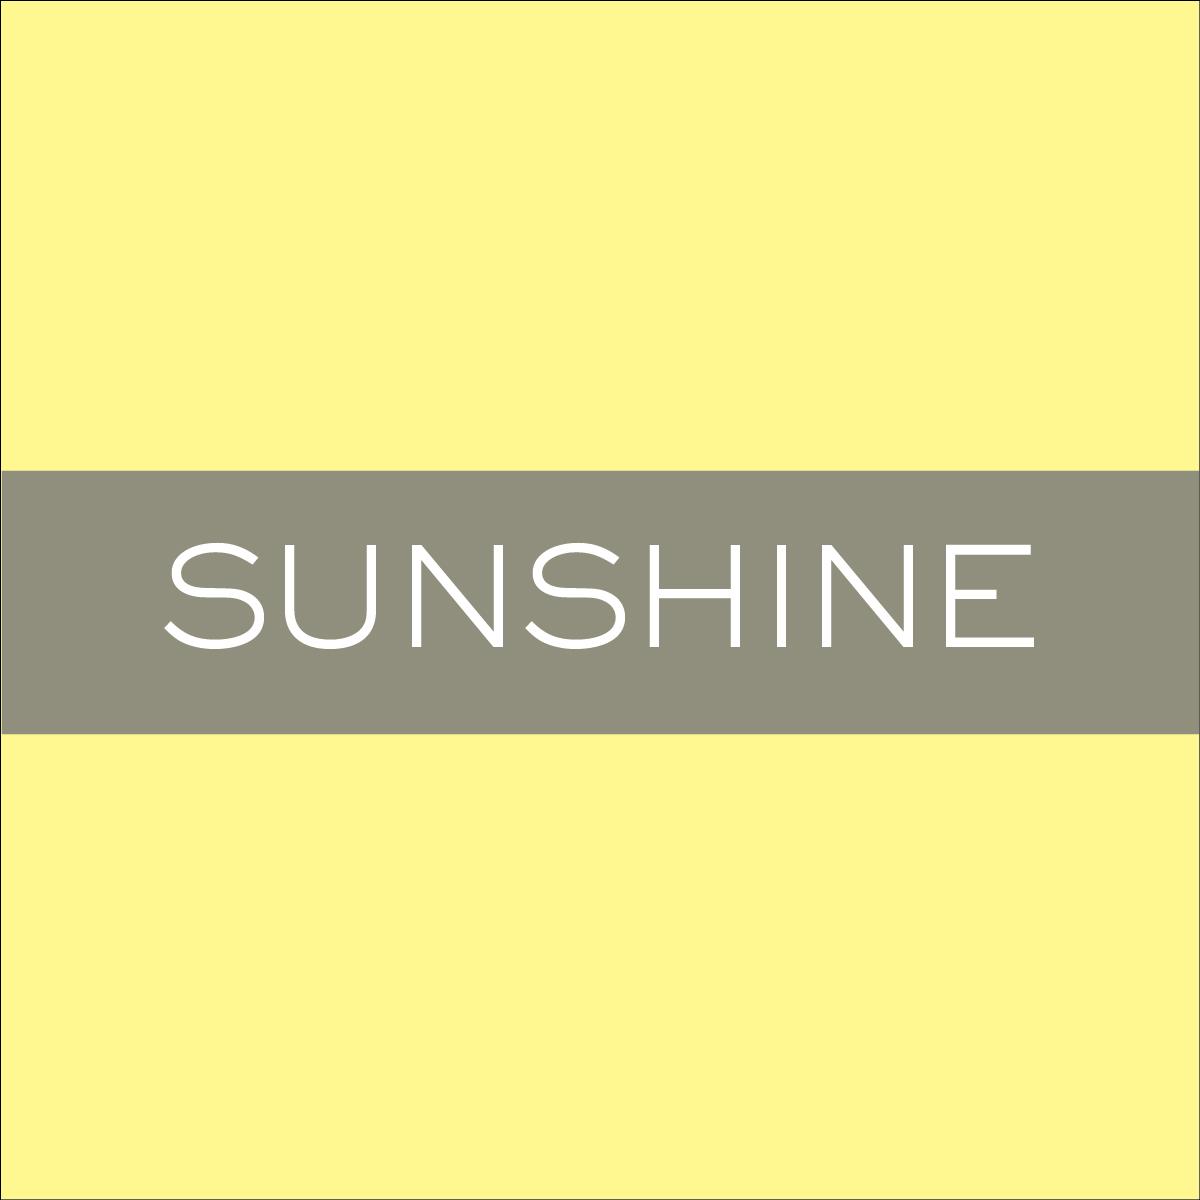 INK_Sunshine.jpg